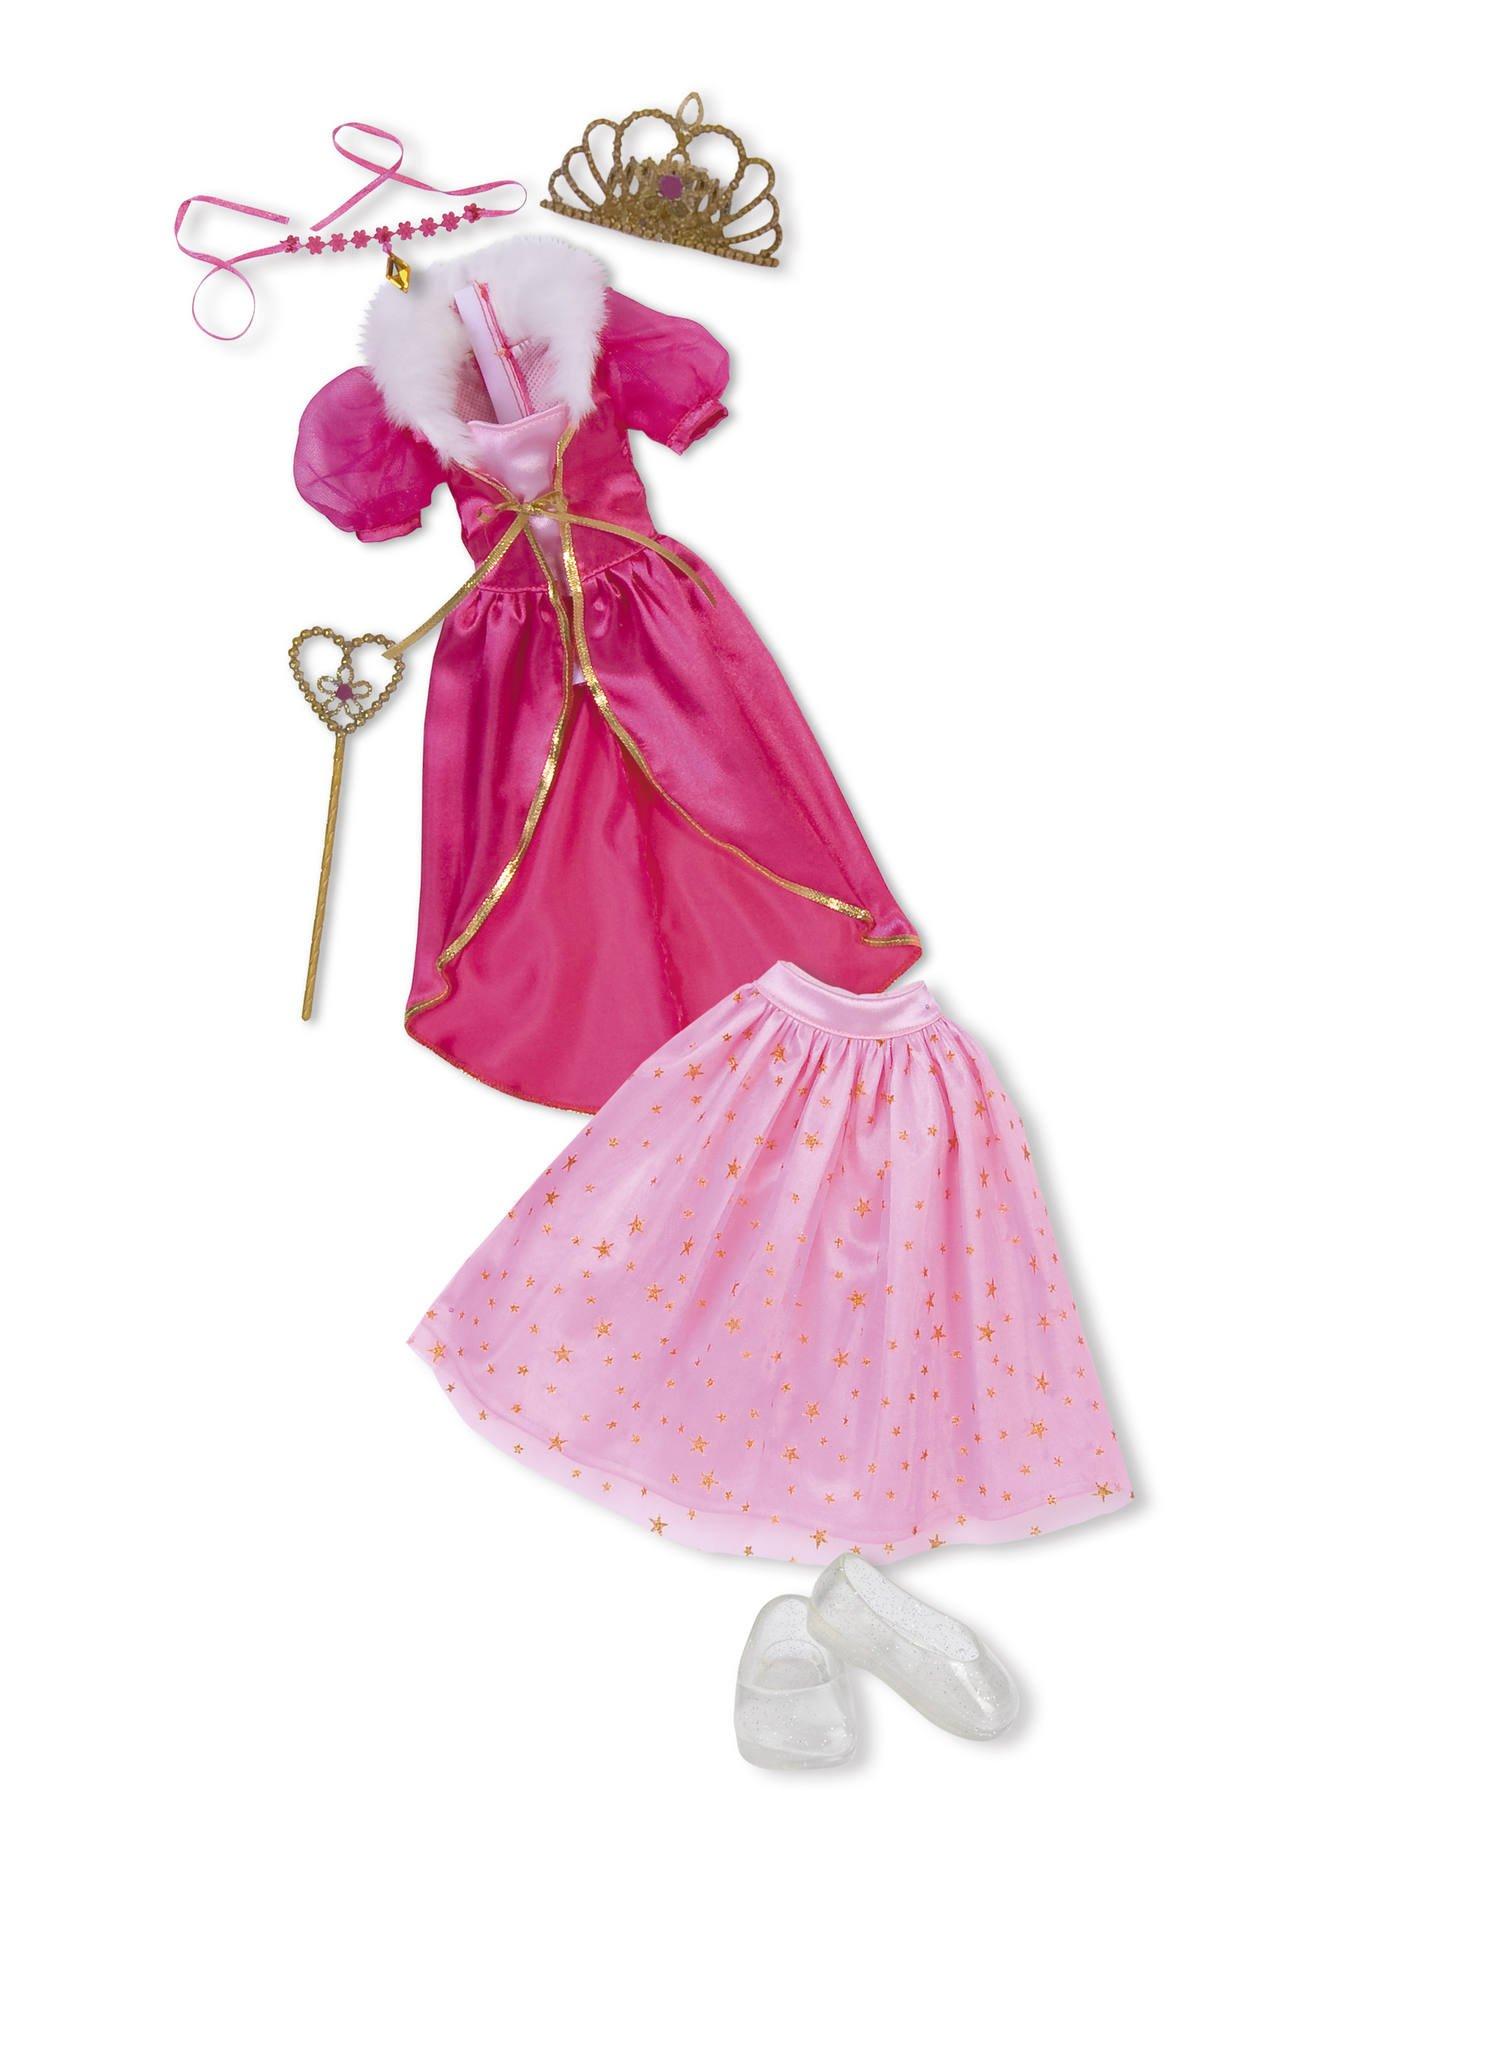 Amazon.es: Nancy - Pack De Ropita 3 Deseos (Famosa 700014657 ...